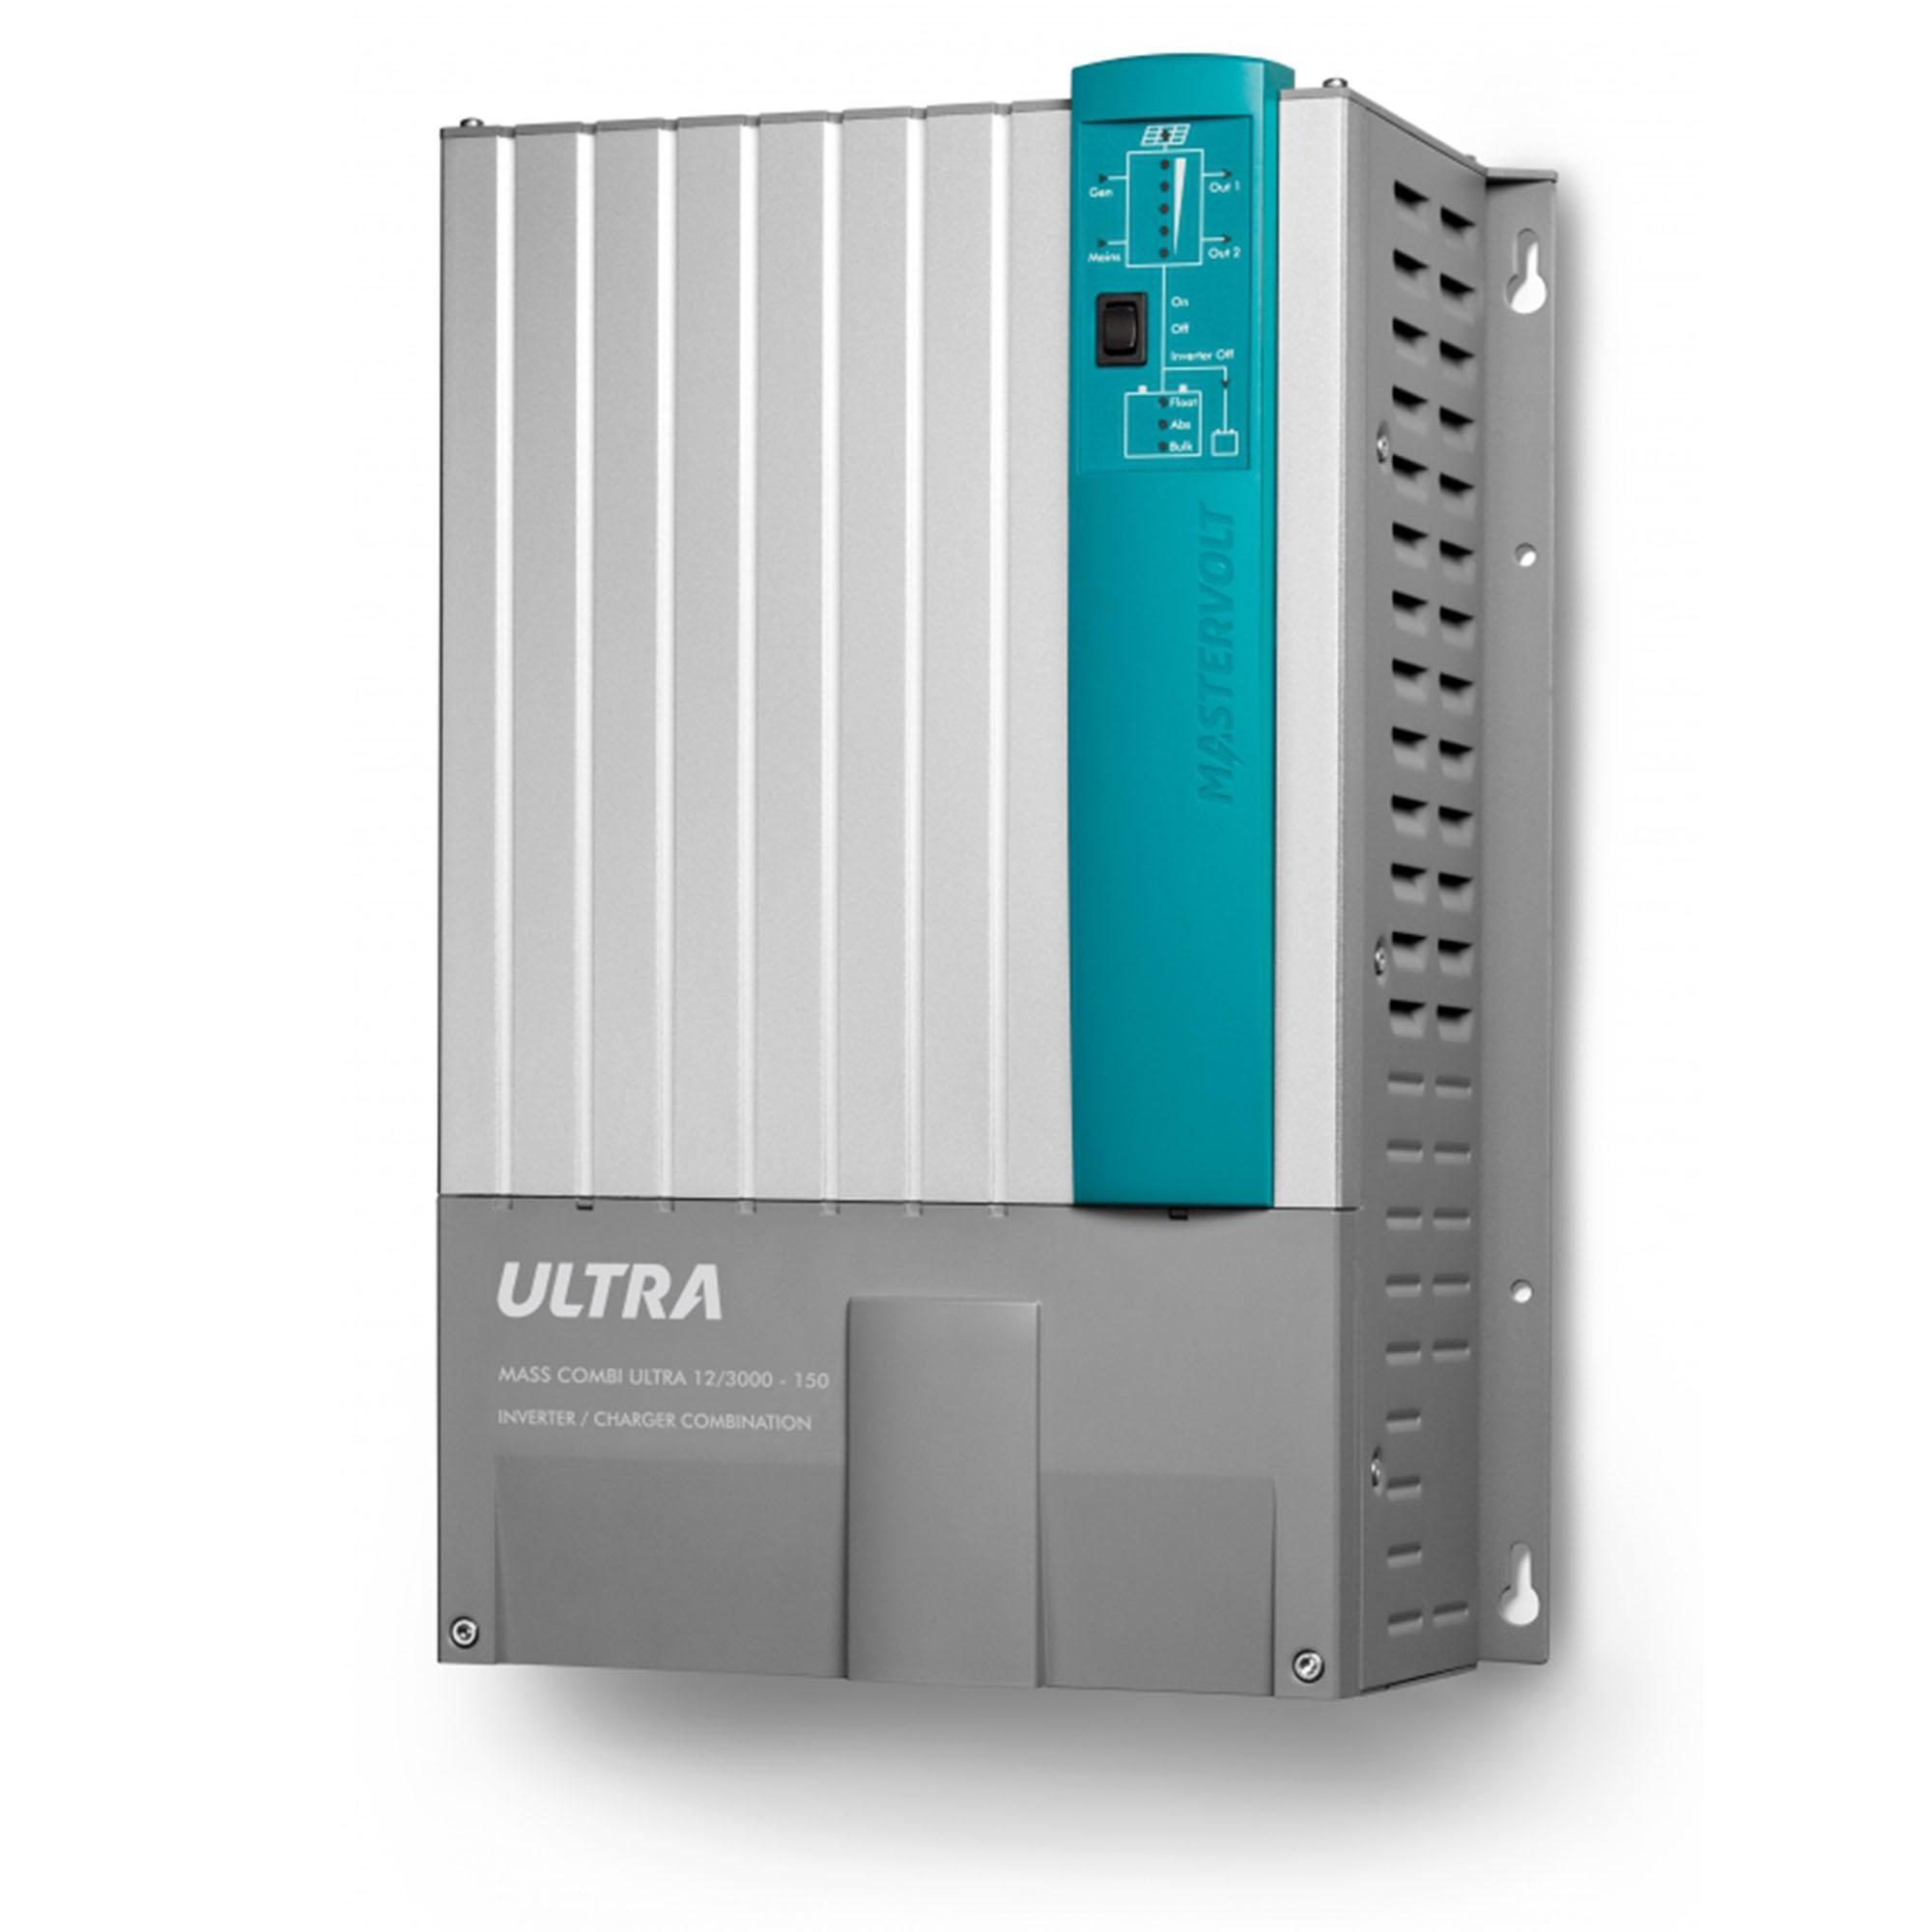 Electric Generator Ultra Simple Ac Igbt Welder Schematic Manufacturers In Lulusoso